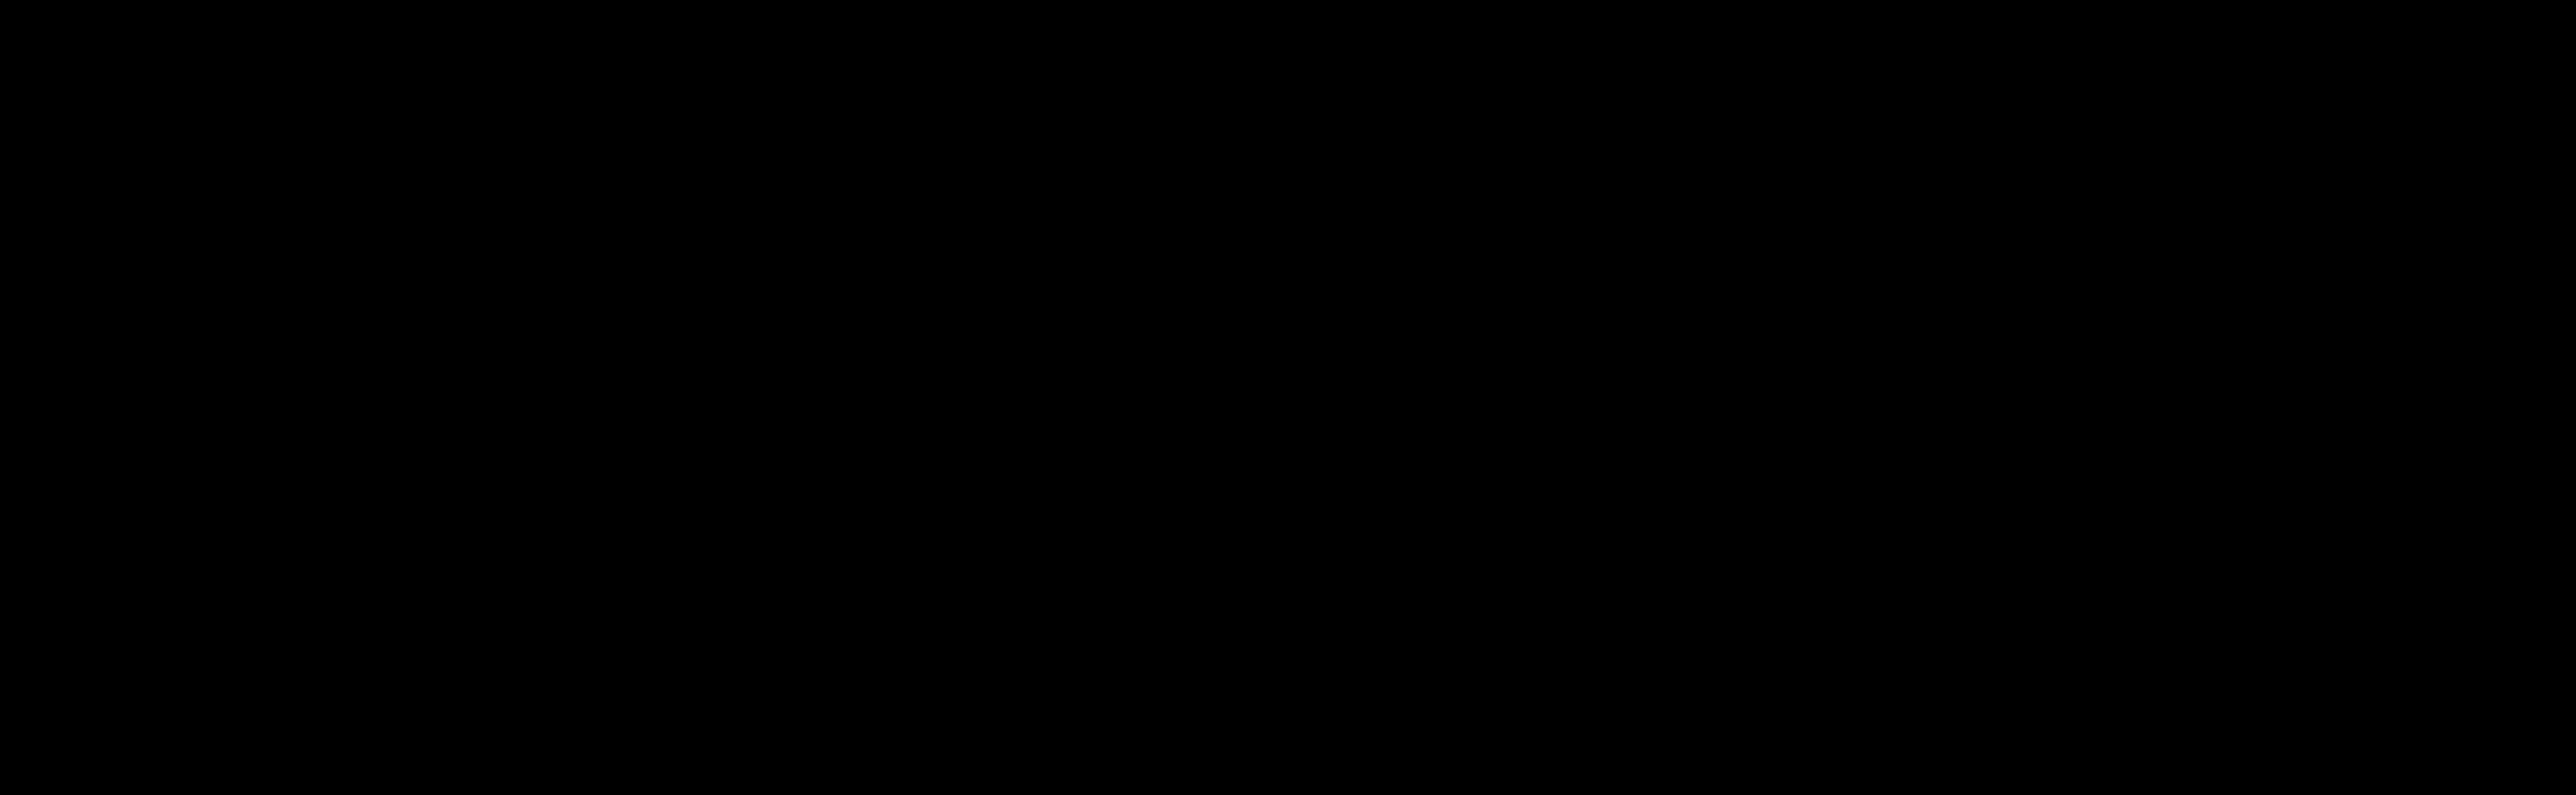 CAYIRES